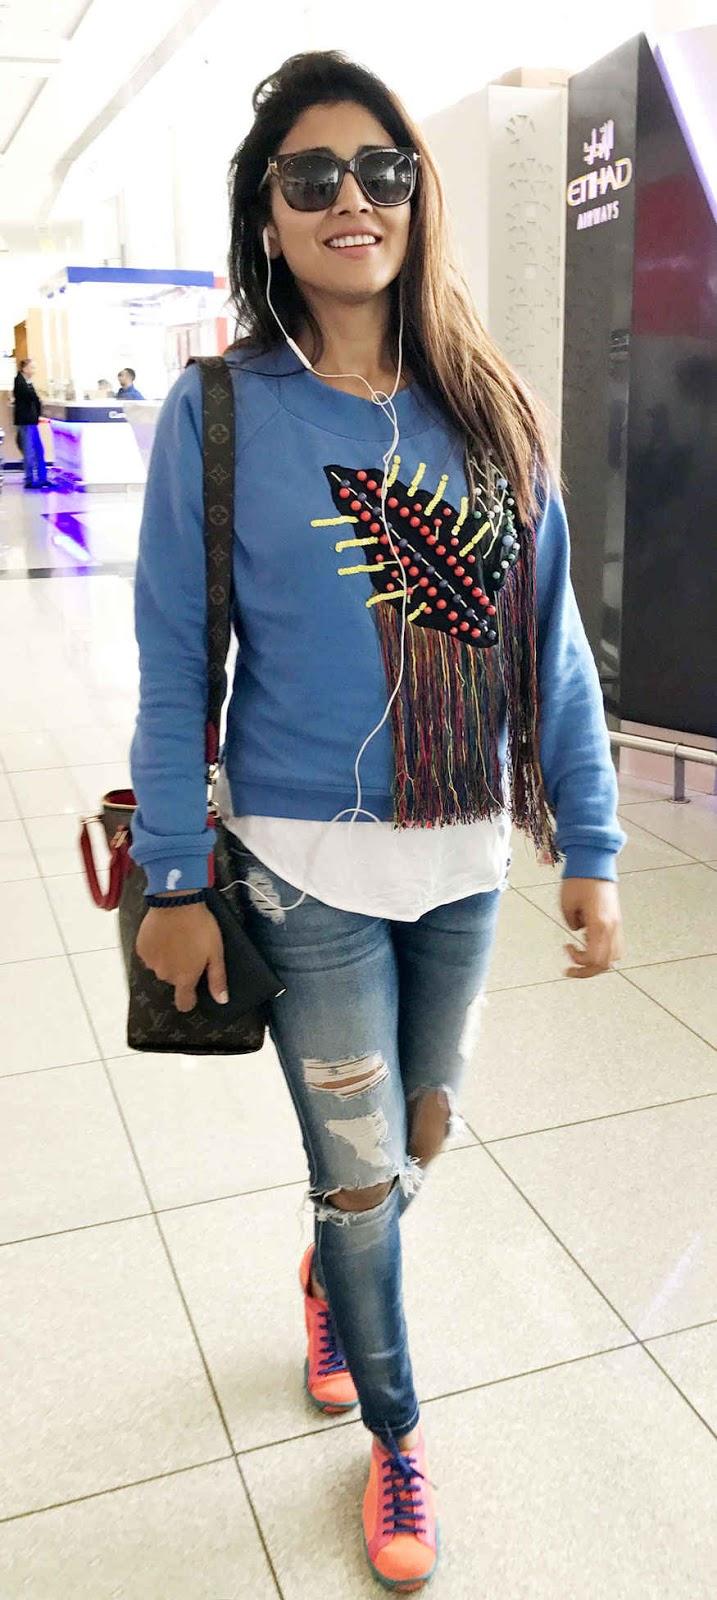 Shriya Saran Spotted at Airport In Abu Dhabi, United Arab Emirates